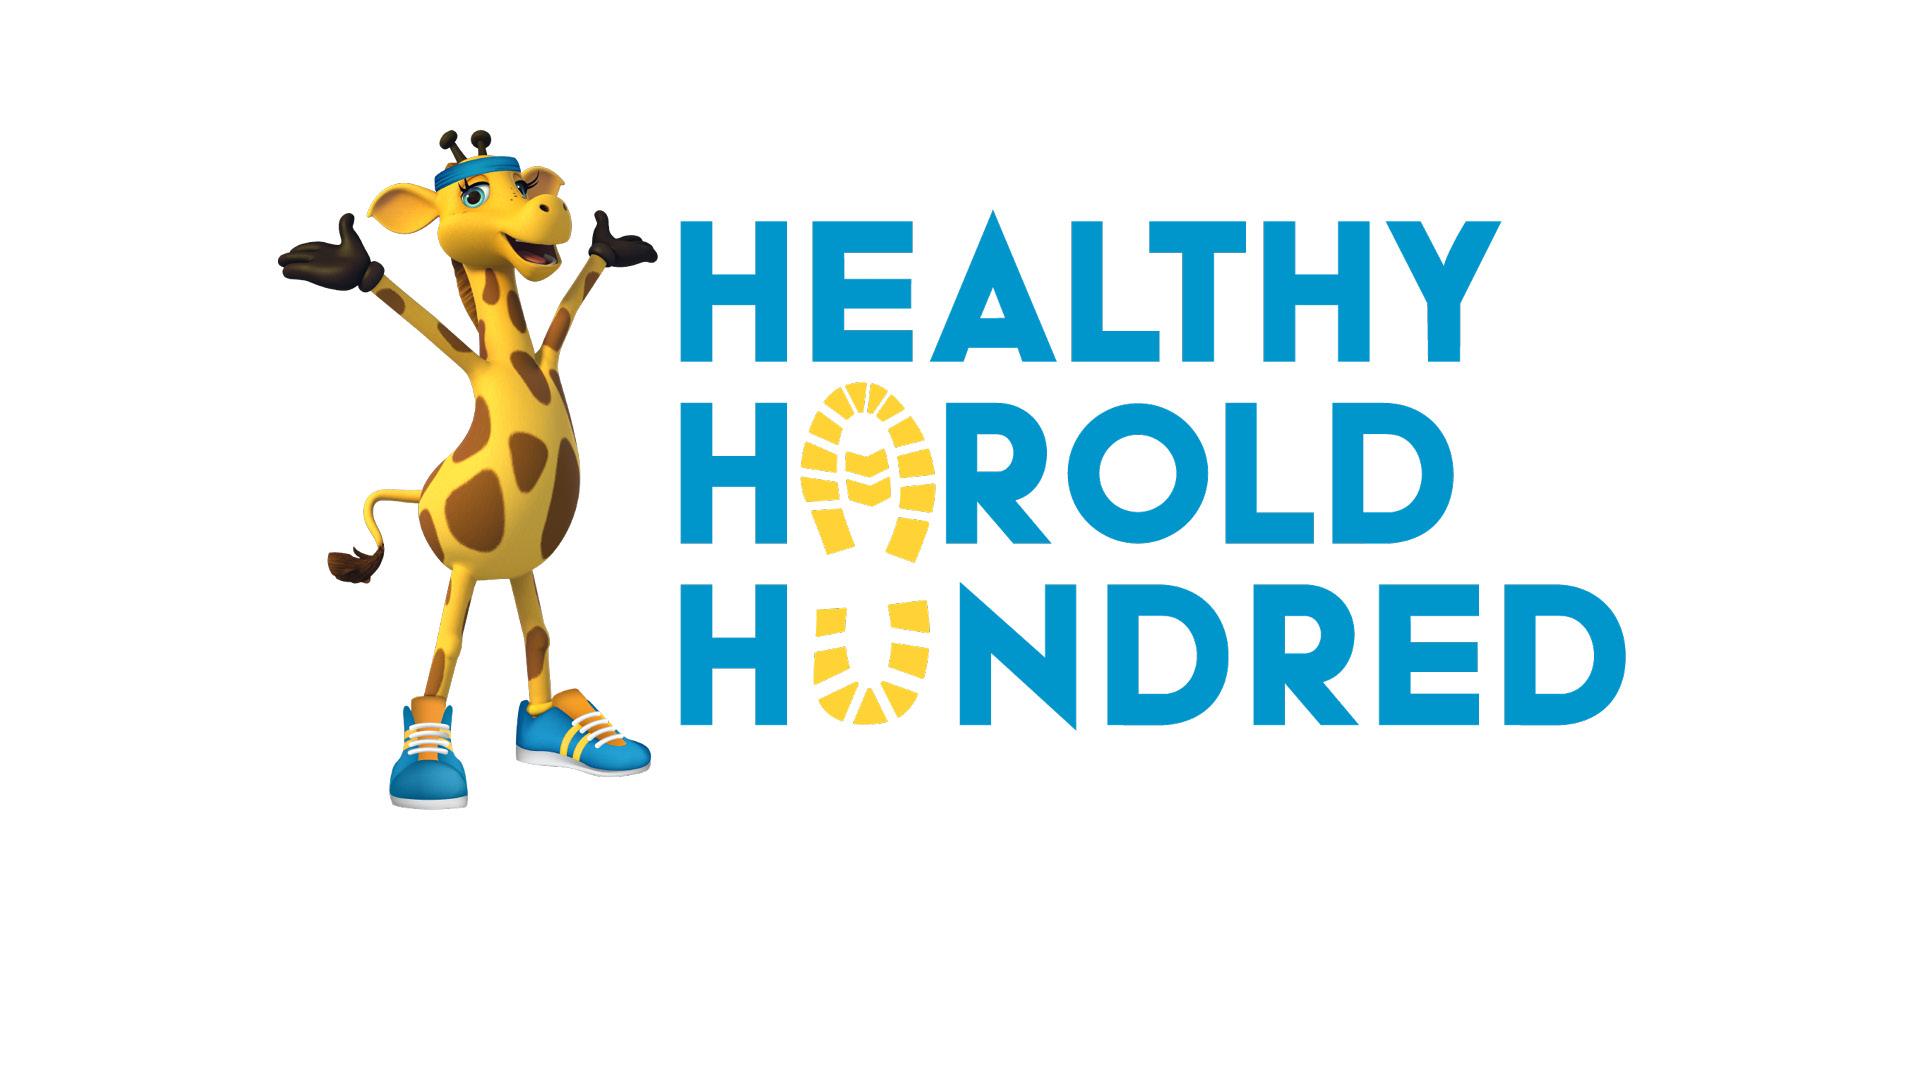 Healthy Harold Hundred fundraising event